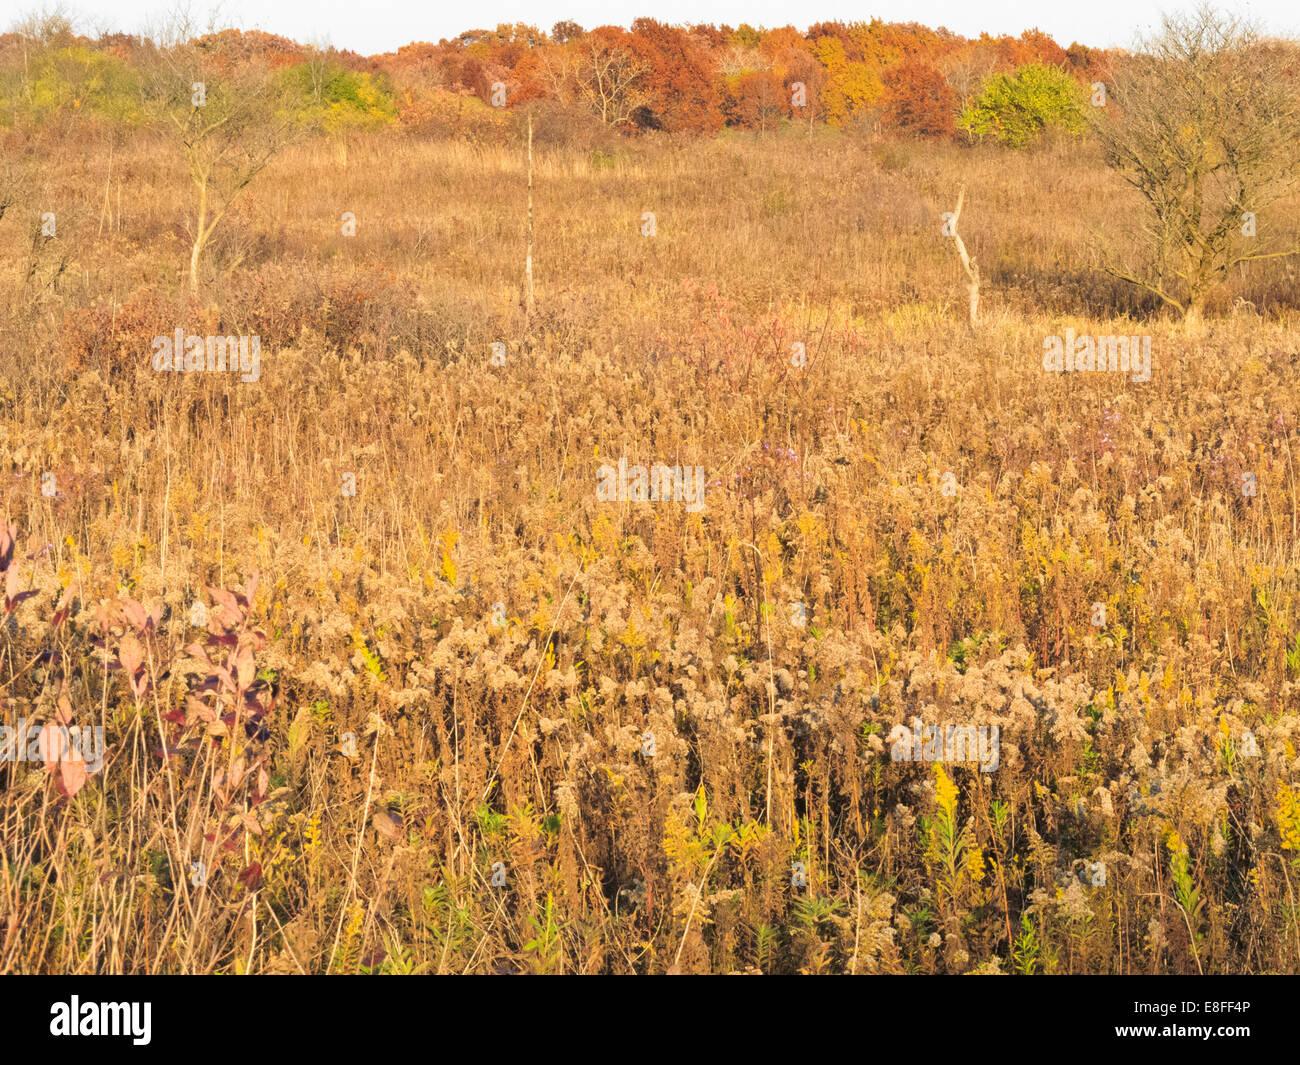 USA, Illinois, DuPage County, Darien, Prairie landscape in autumn - Stock Image